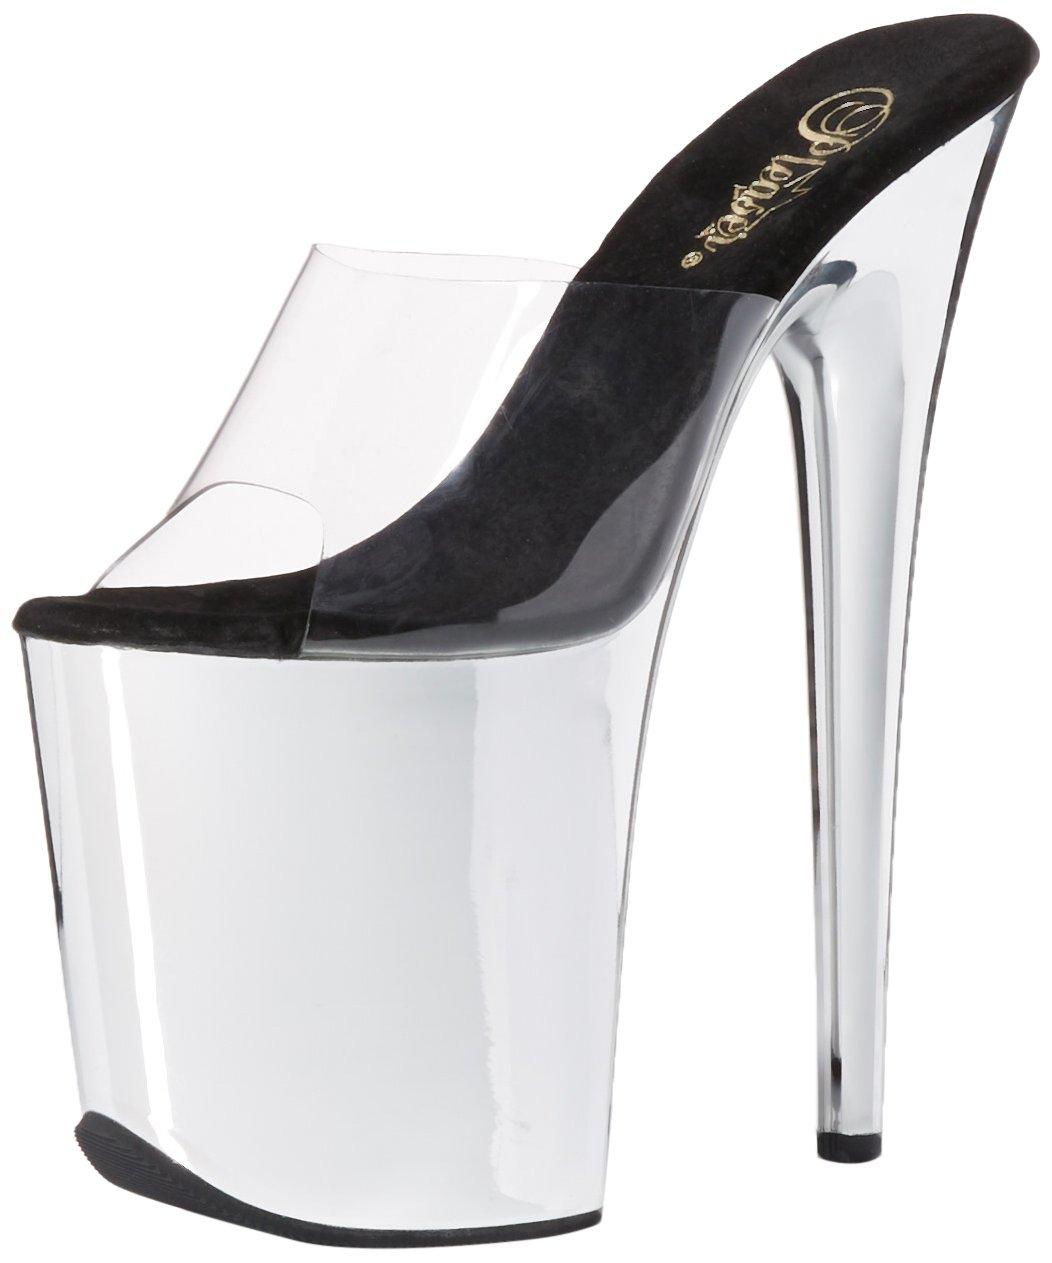 Pleaser Women's FLAM801/C/Sch Platform Dress Sandal B014J143Z8 10 B(M) US|Clear/Silver Chrome